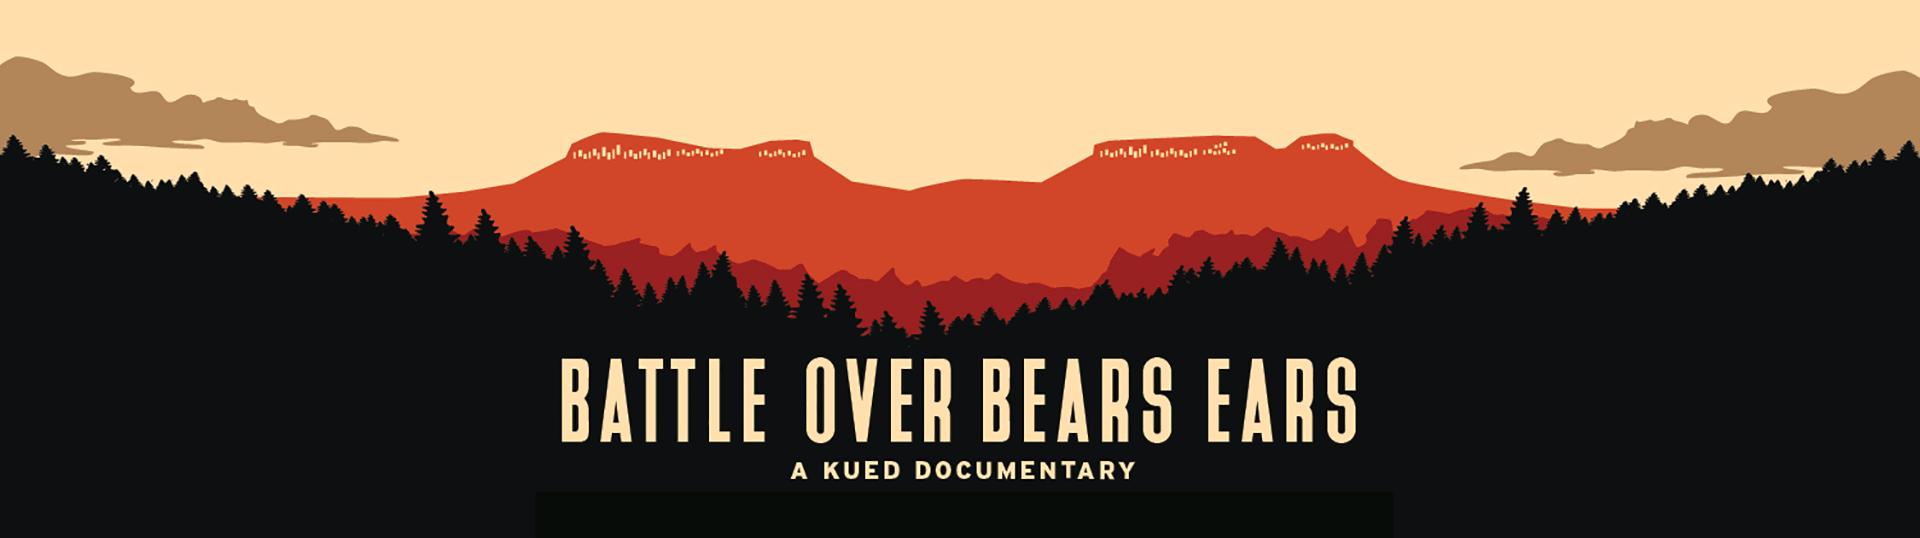 Battle Over Bears Ears, a KUED Documentary